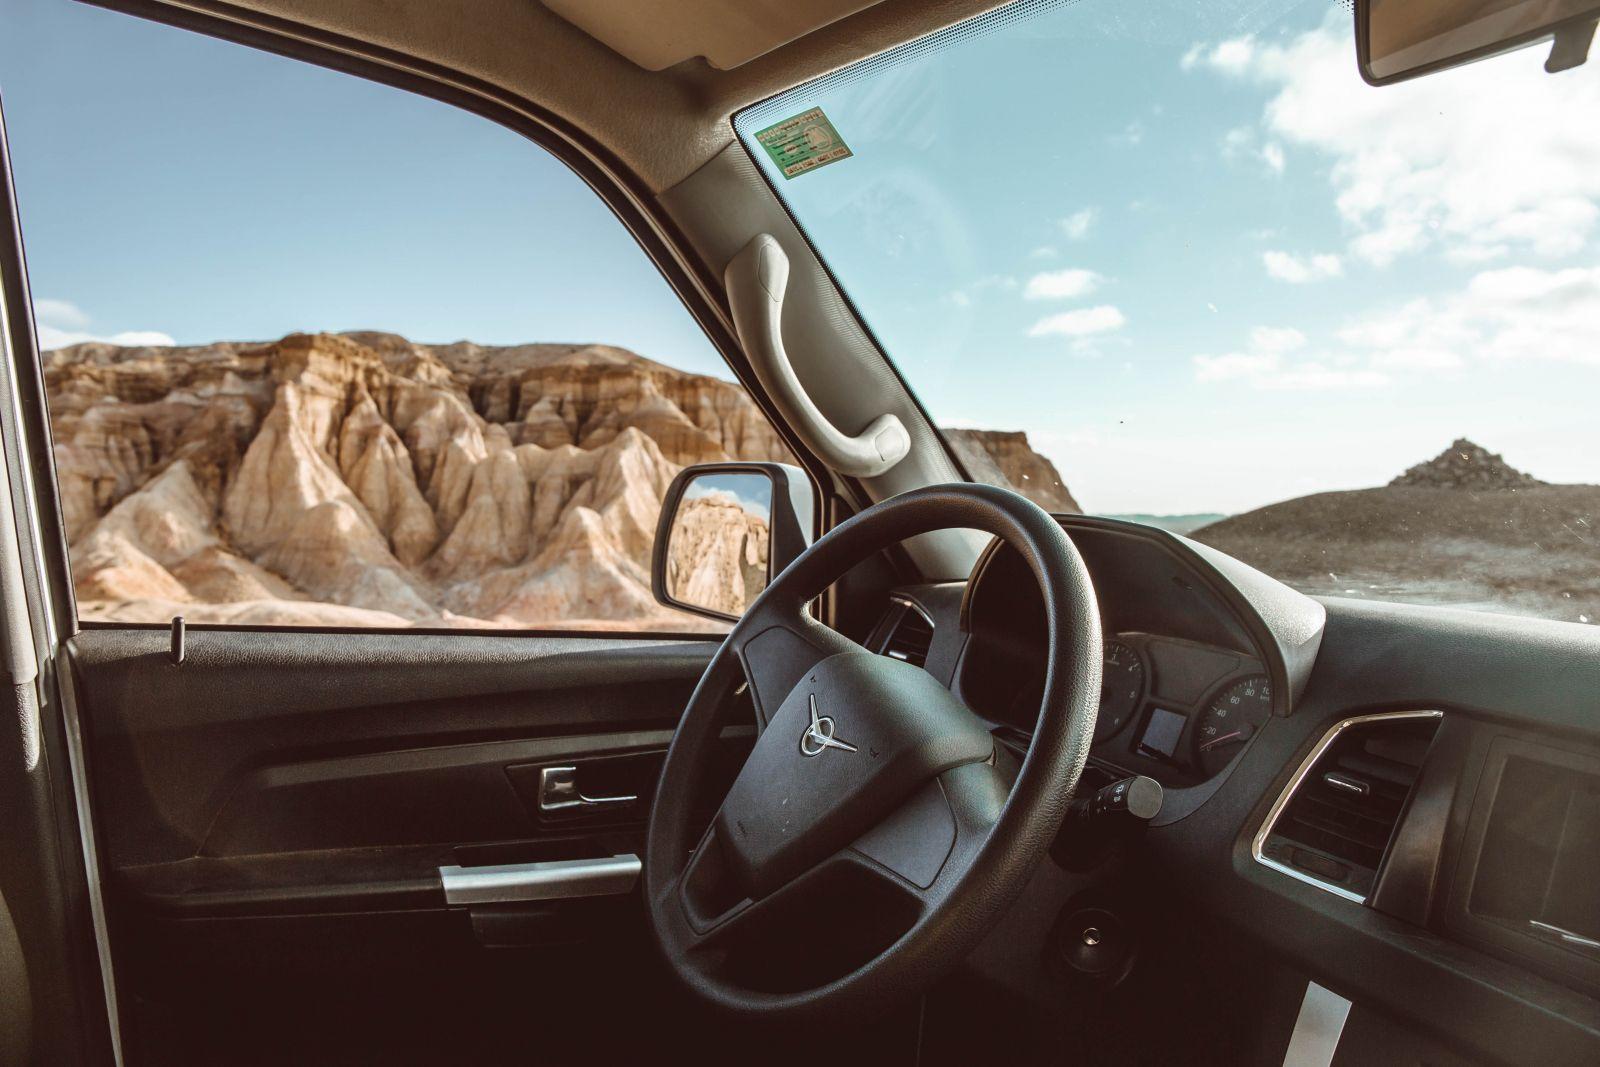 UAZ Patriot Car Rental Mongolia